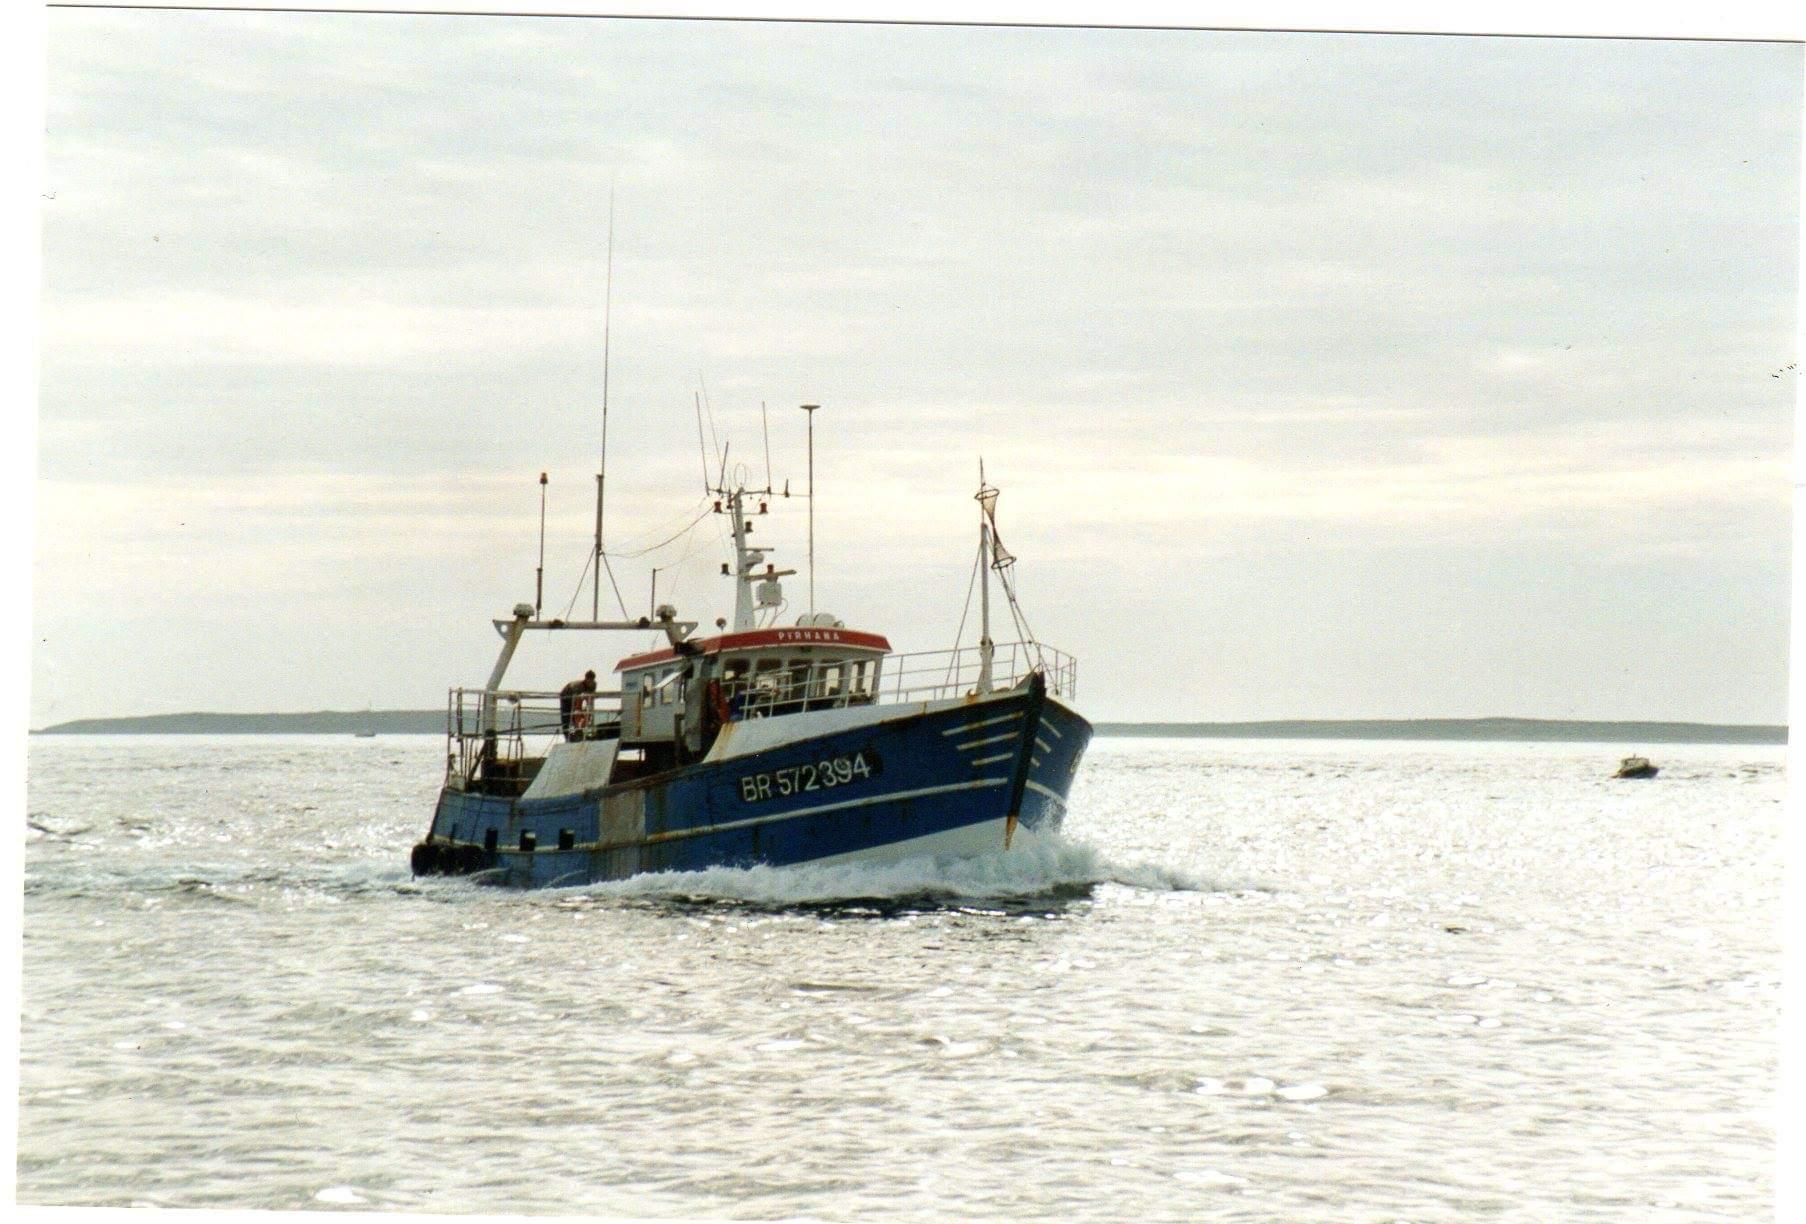 Br 572394 piranha